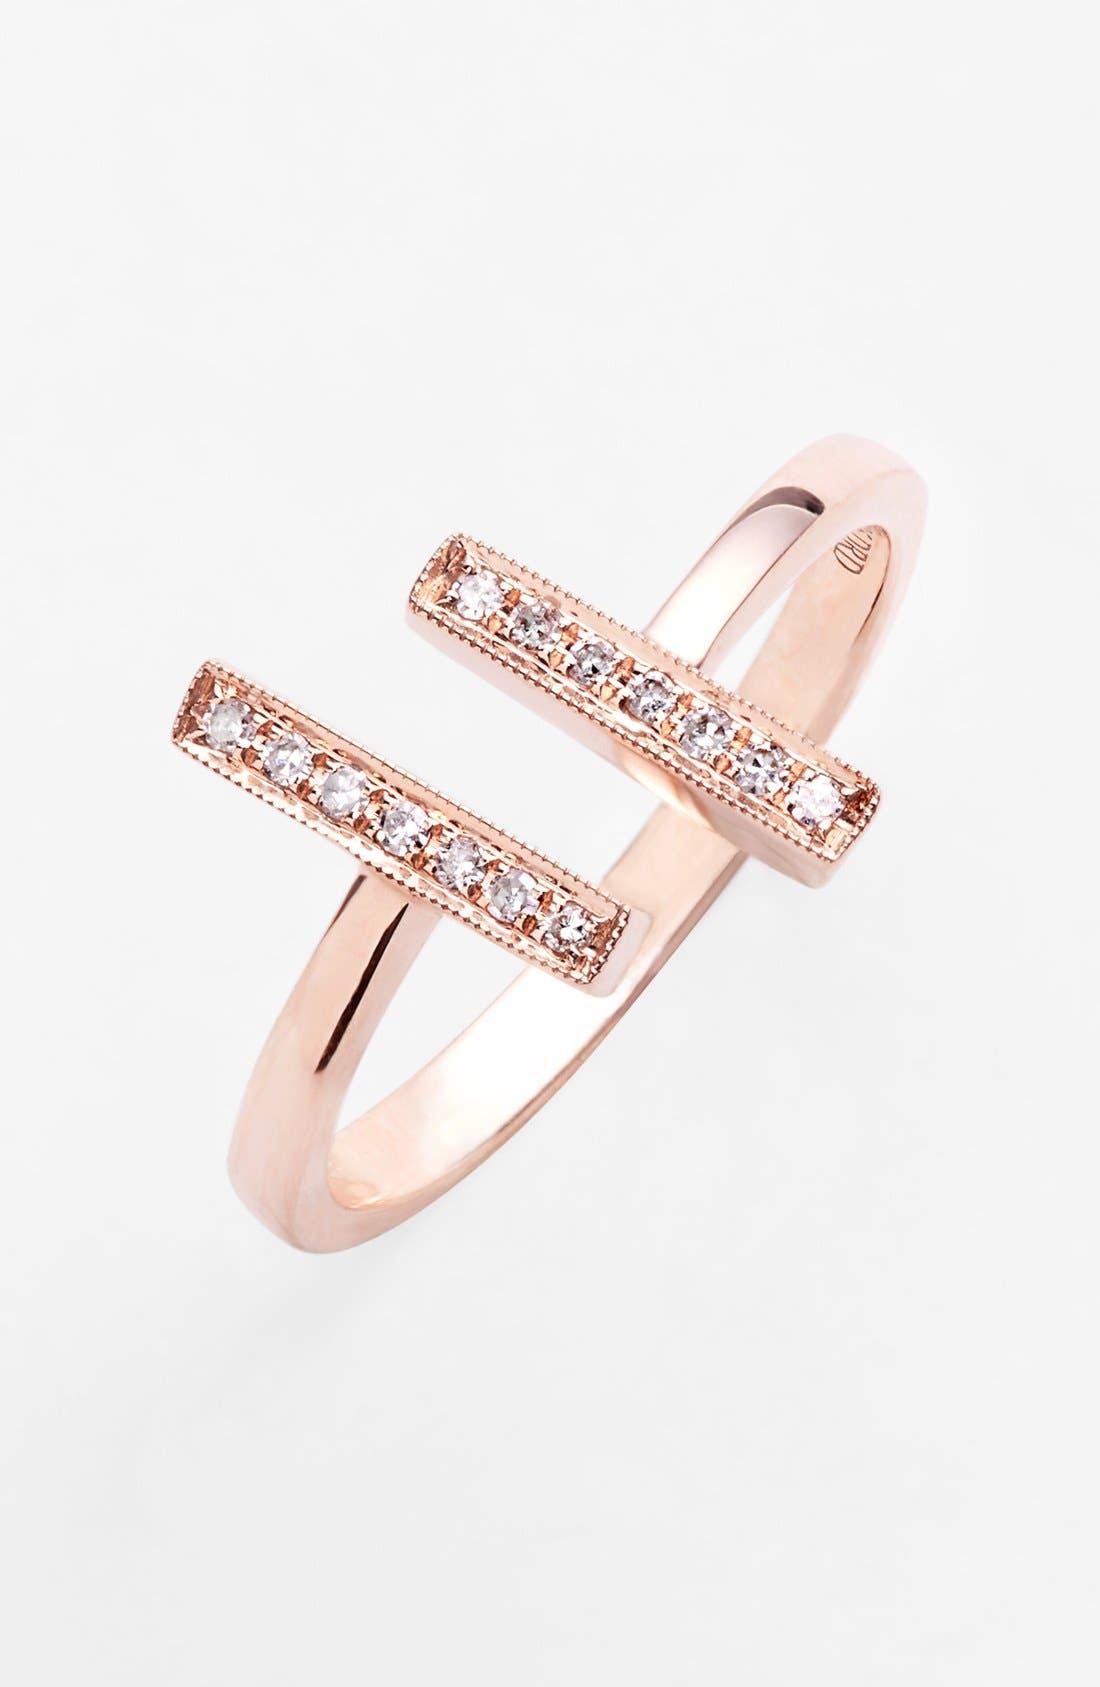 Main Image - Dana Rebecca Designs 'Sylvie Rose' Diamond Open Ring